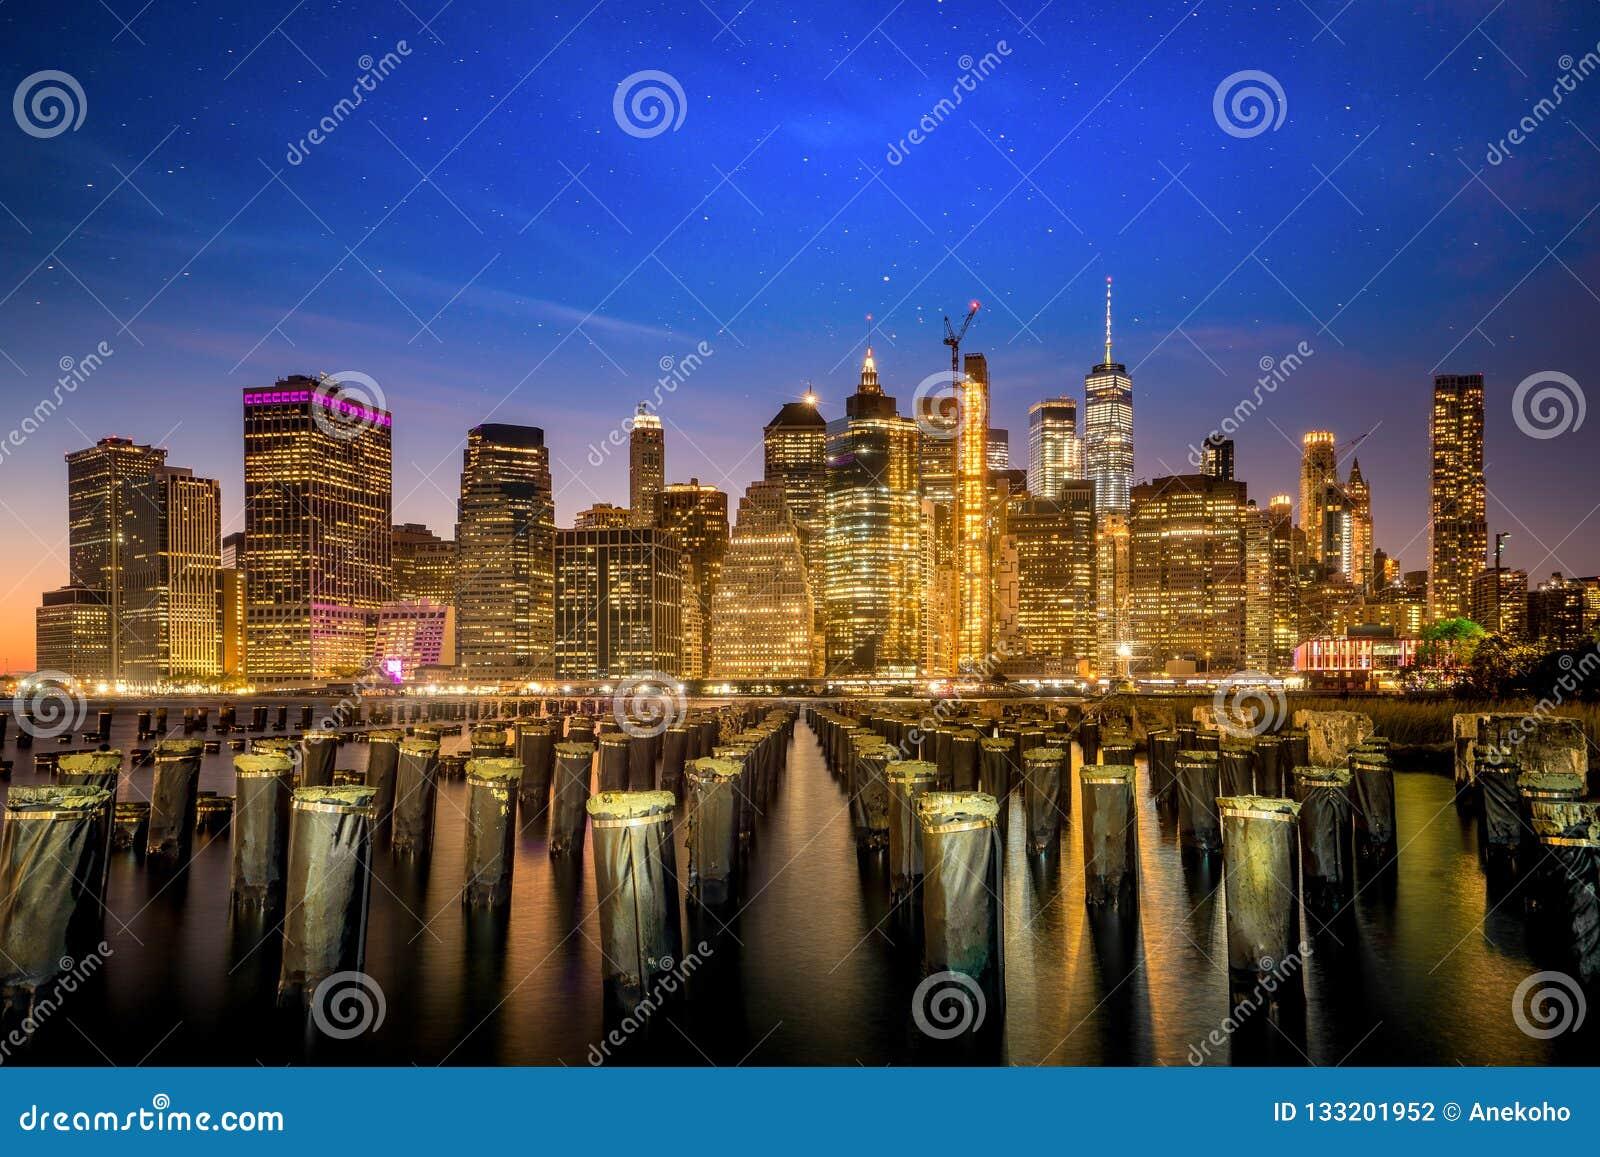 Night Cityscape of New york city